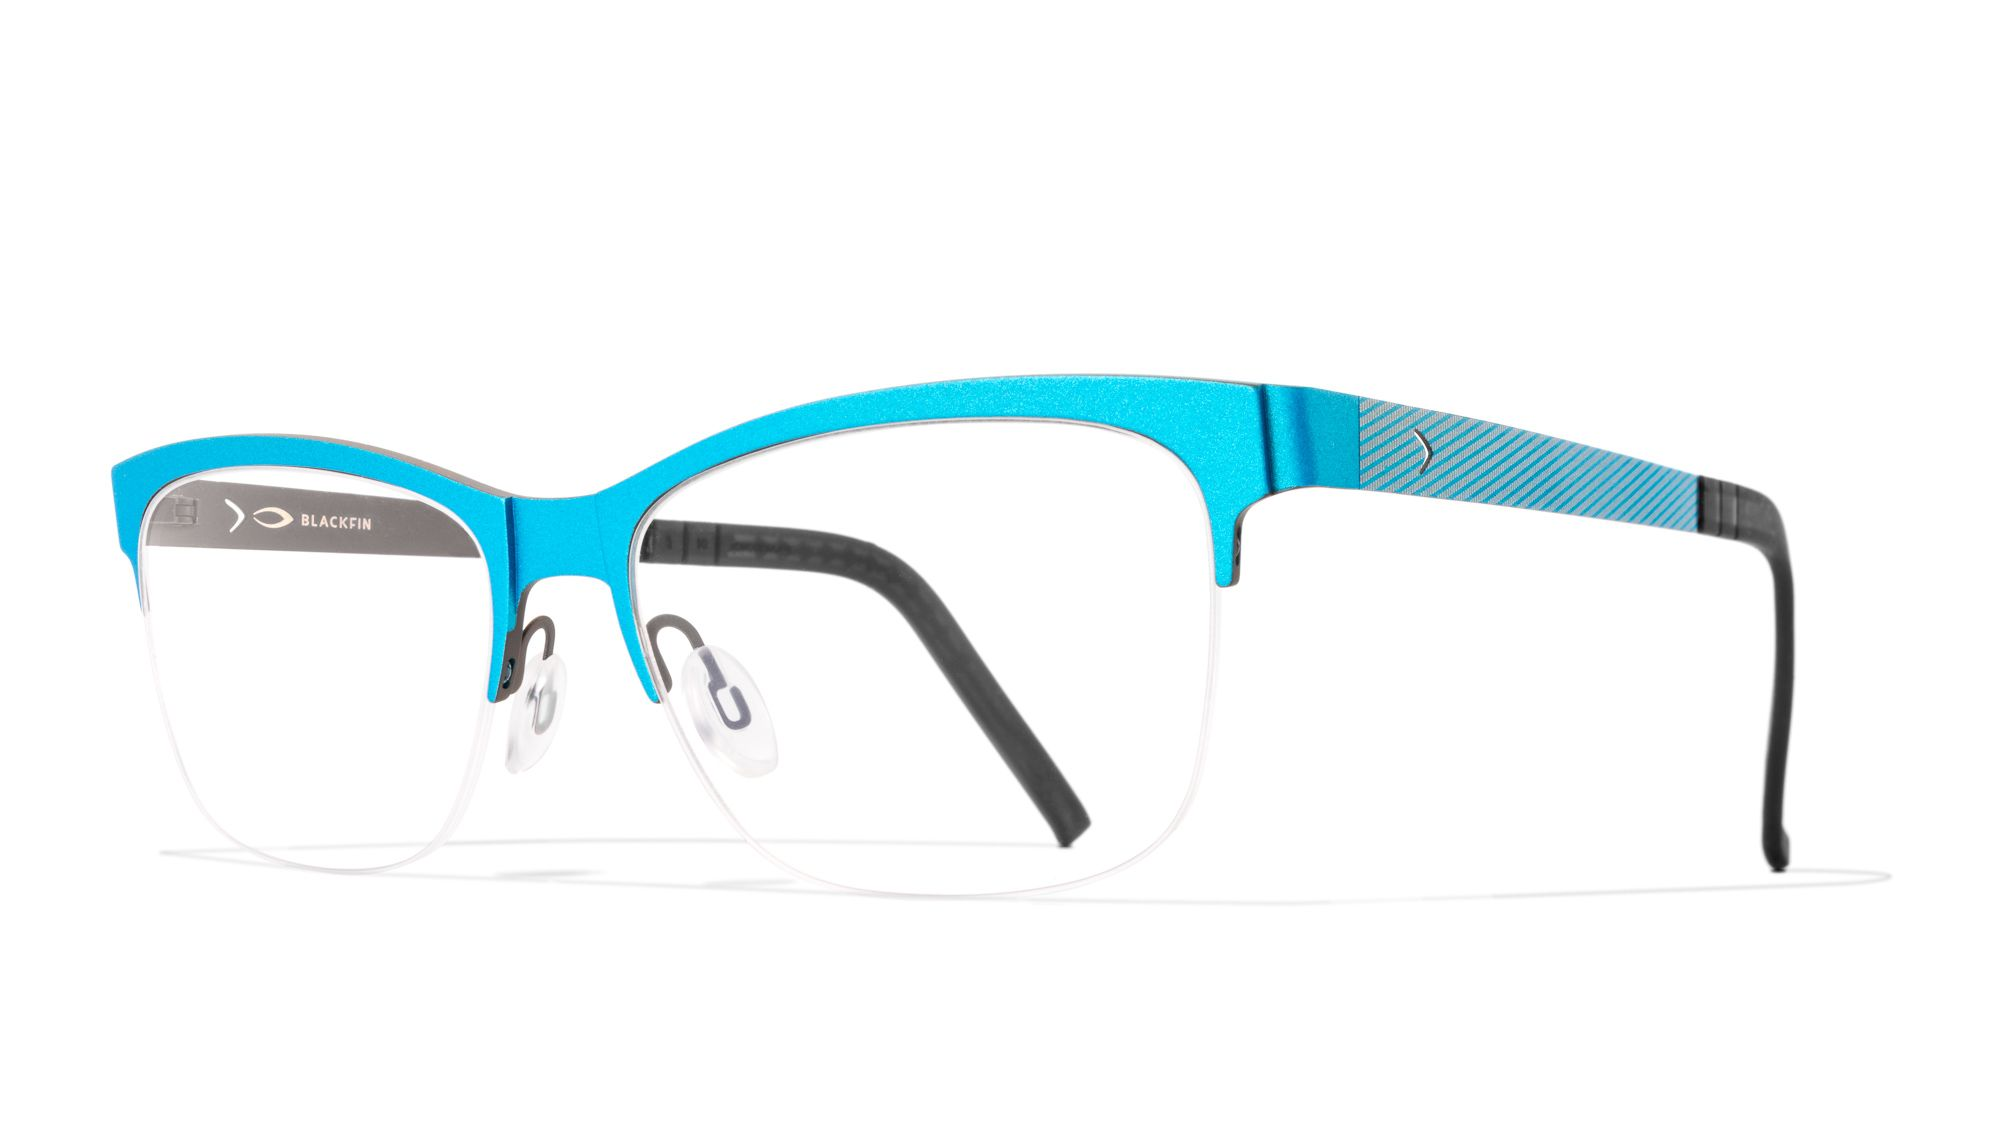 Blackfin - Optical - GRAYS BF752 | Receta2018 | Pinterest